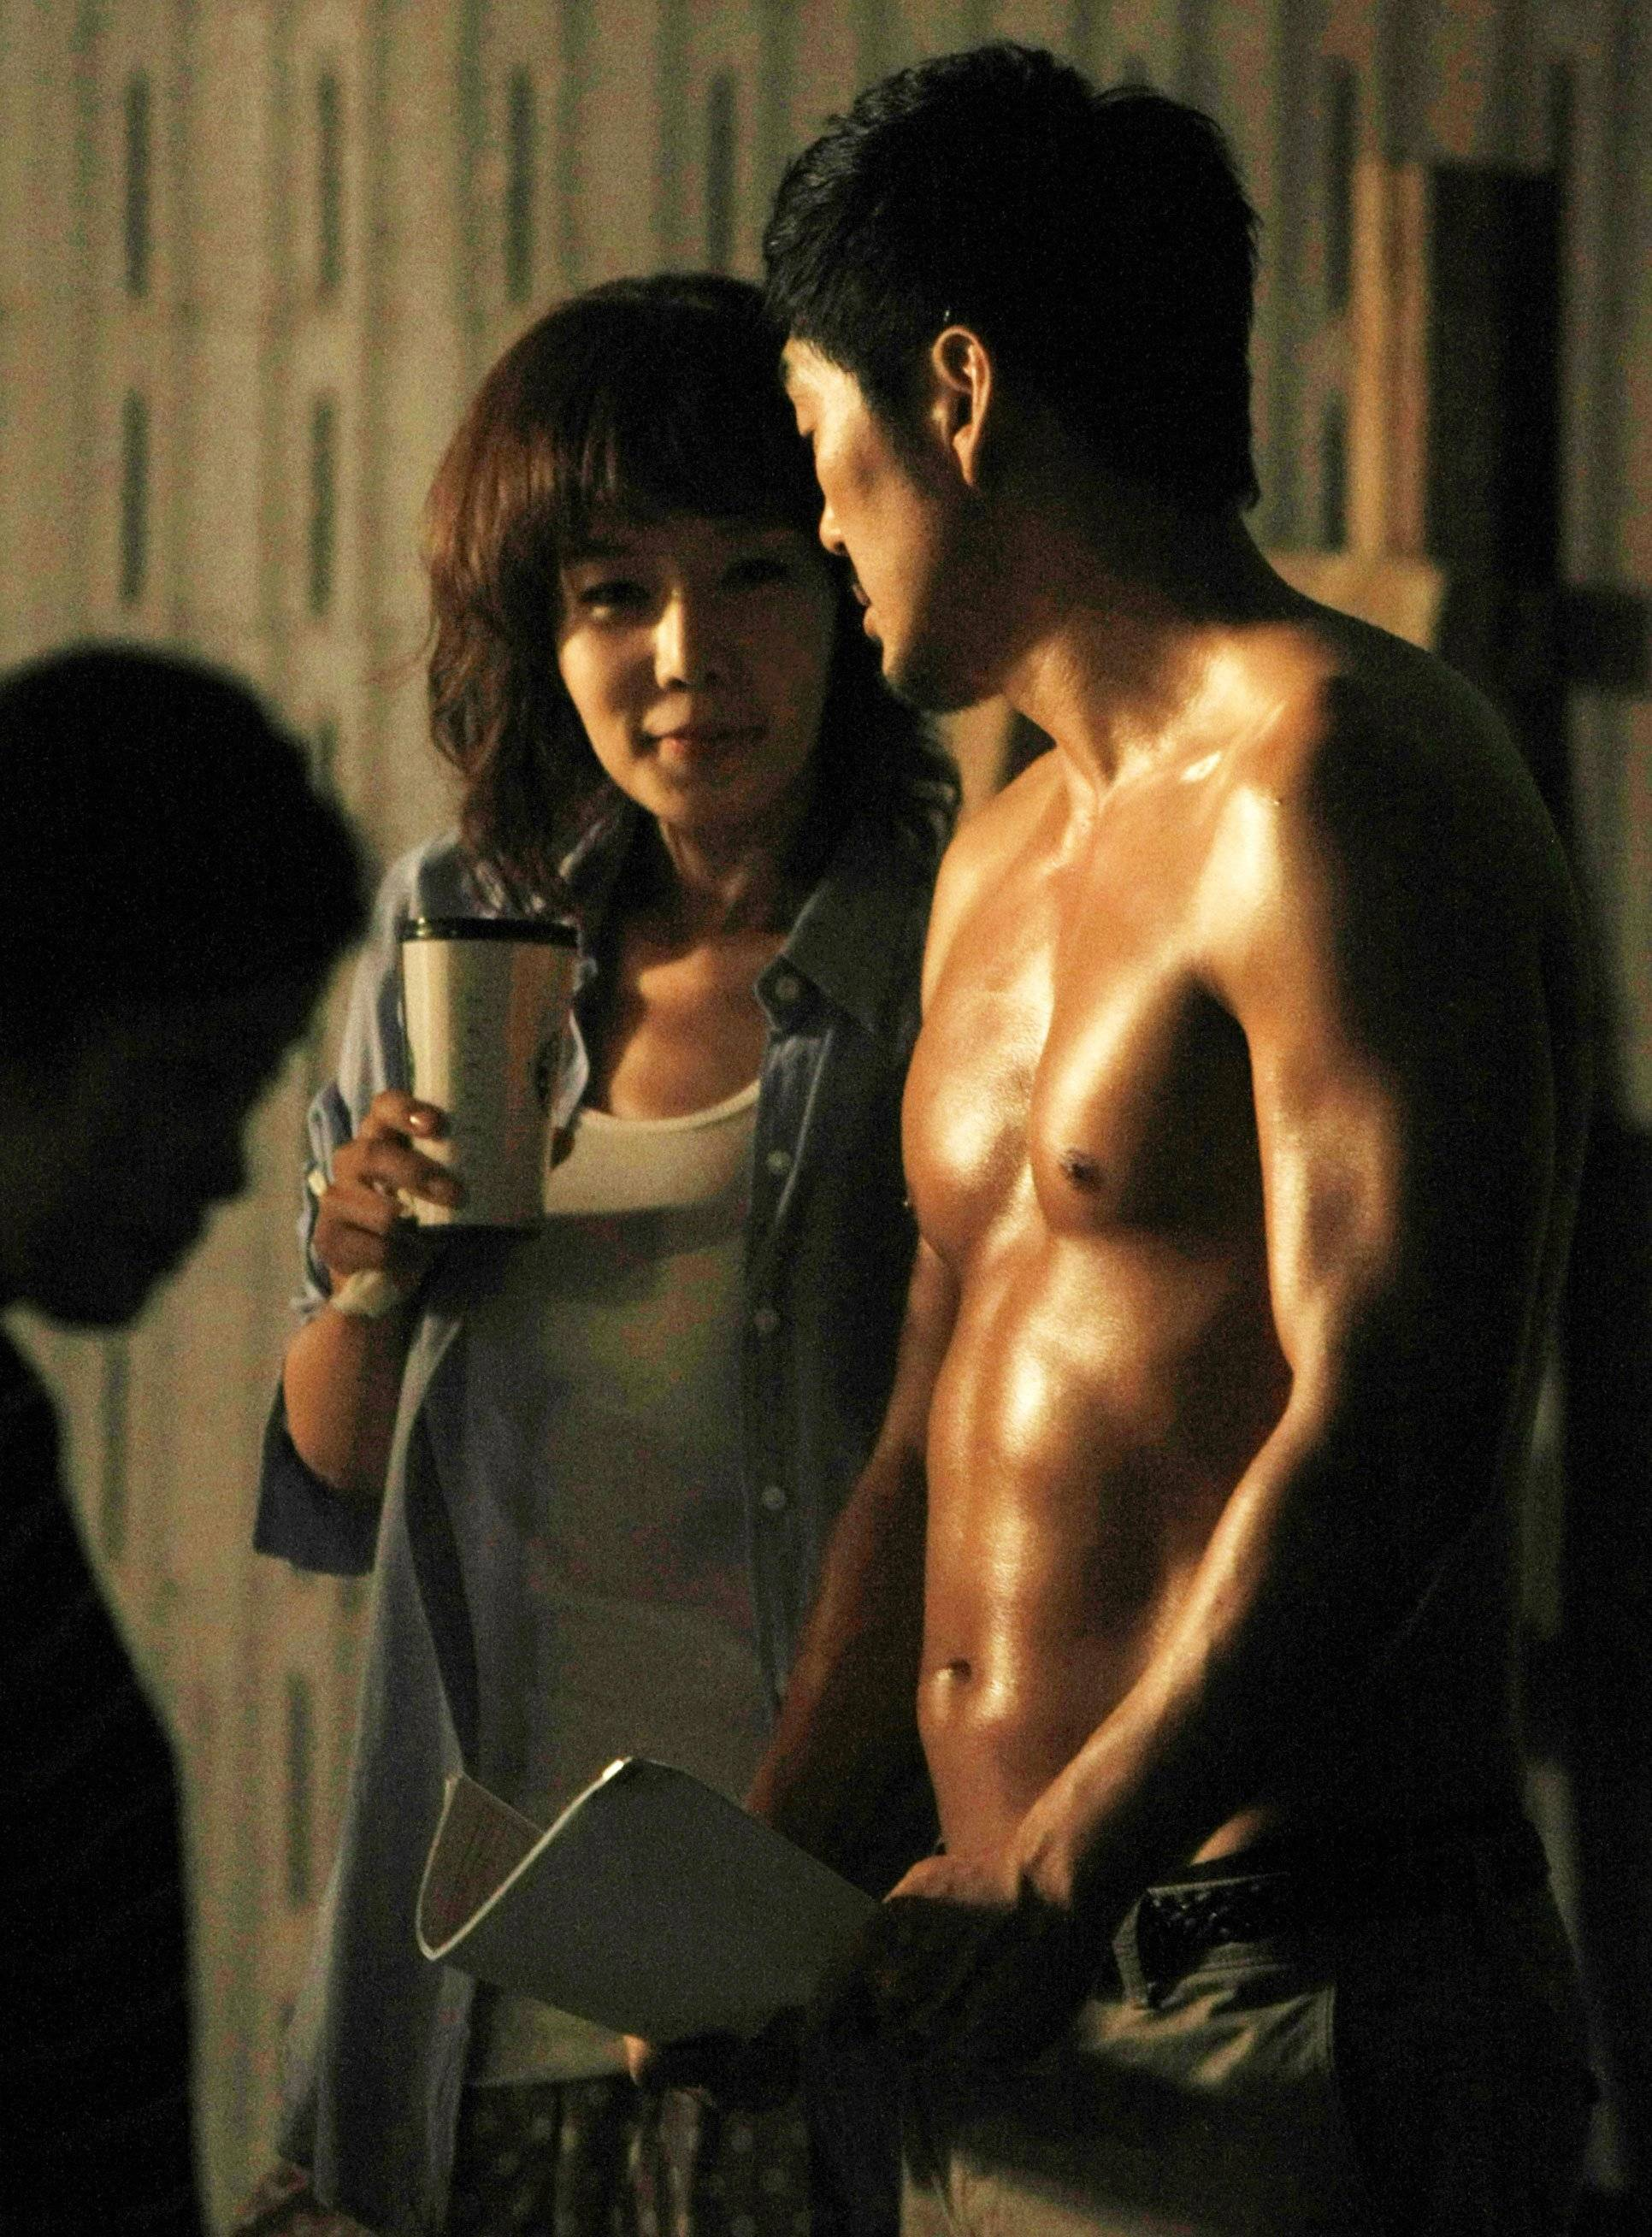 Chae yi yoon perfect partner - 2 part 9